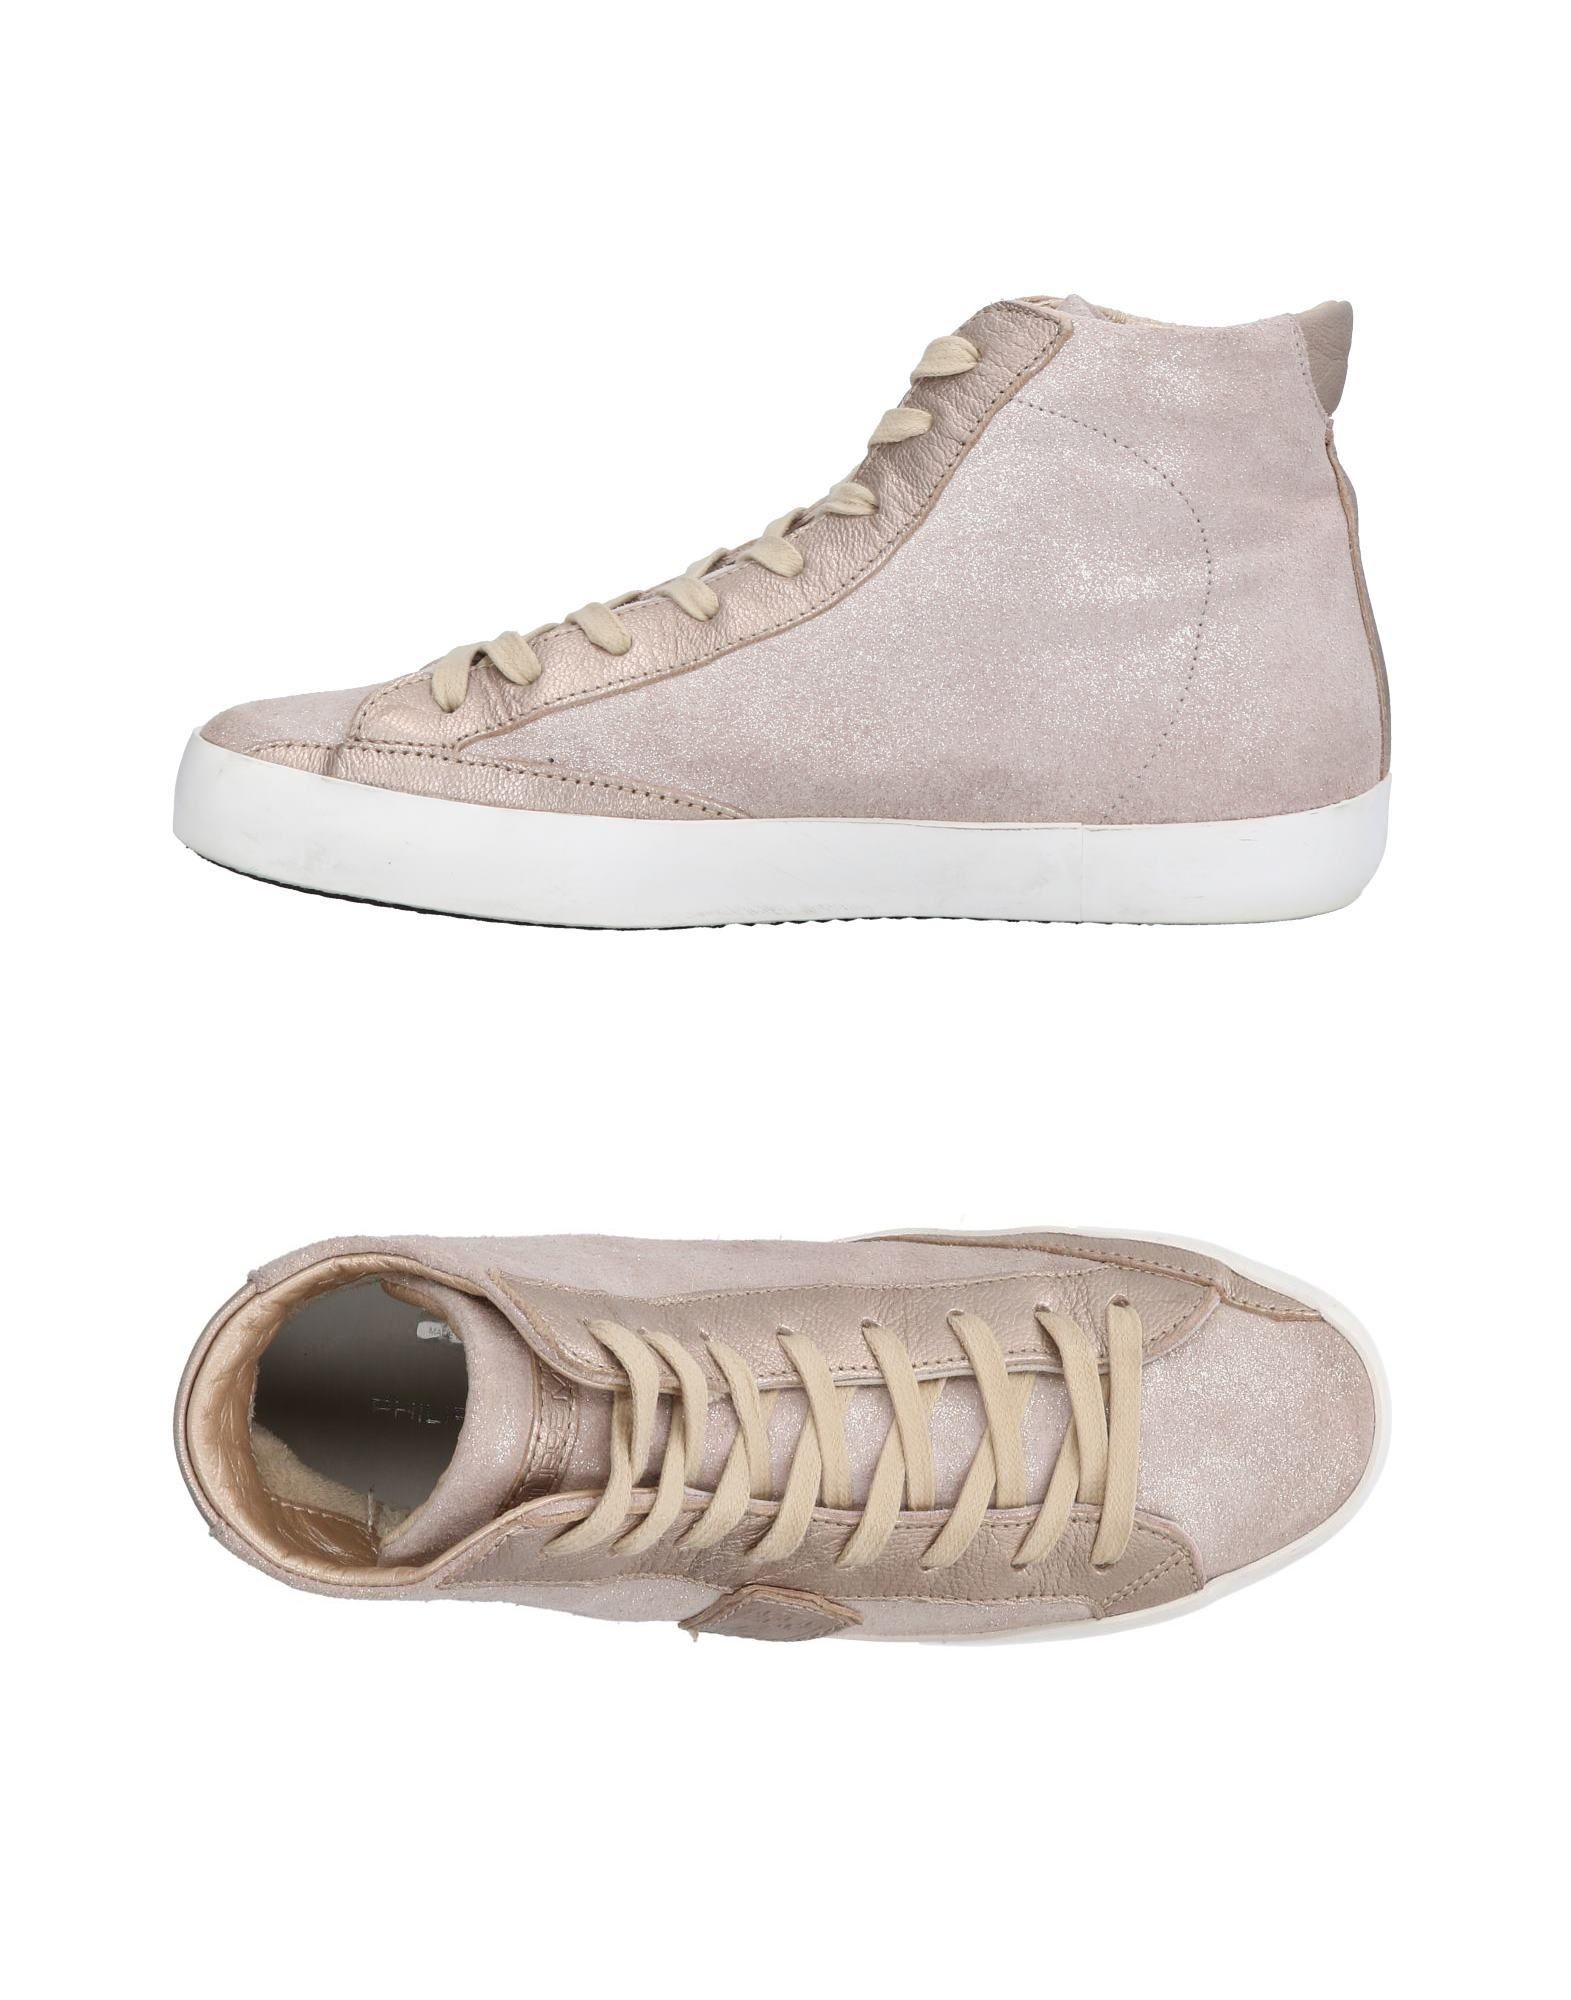 Philippe Model Sneakers Damen  11495321OOGut aussehende strapazierfähige Schuhe